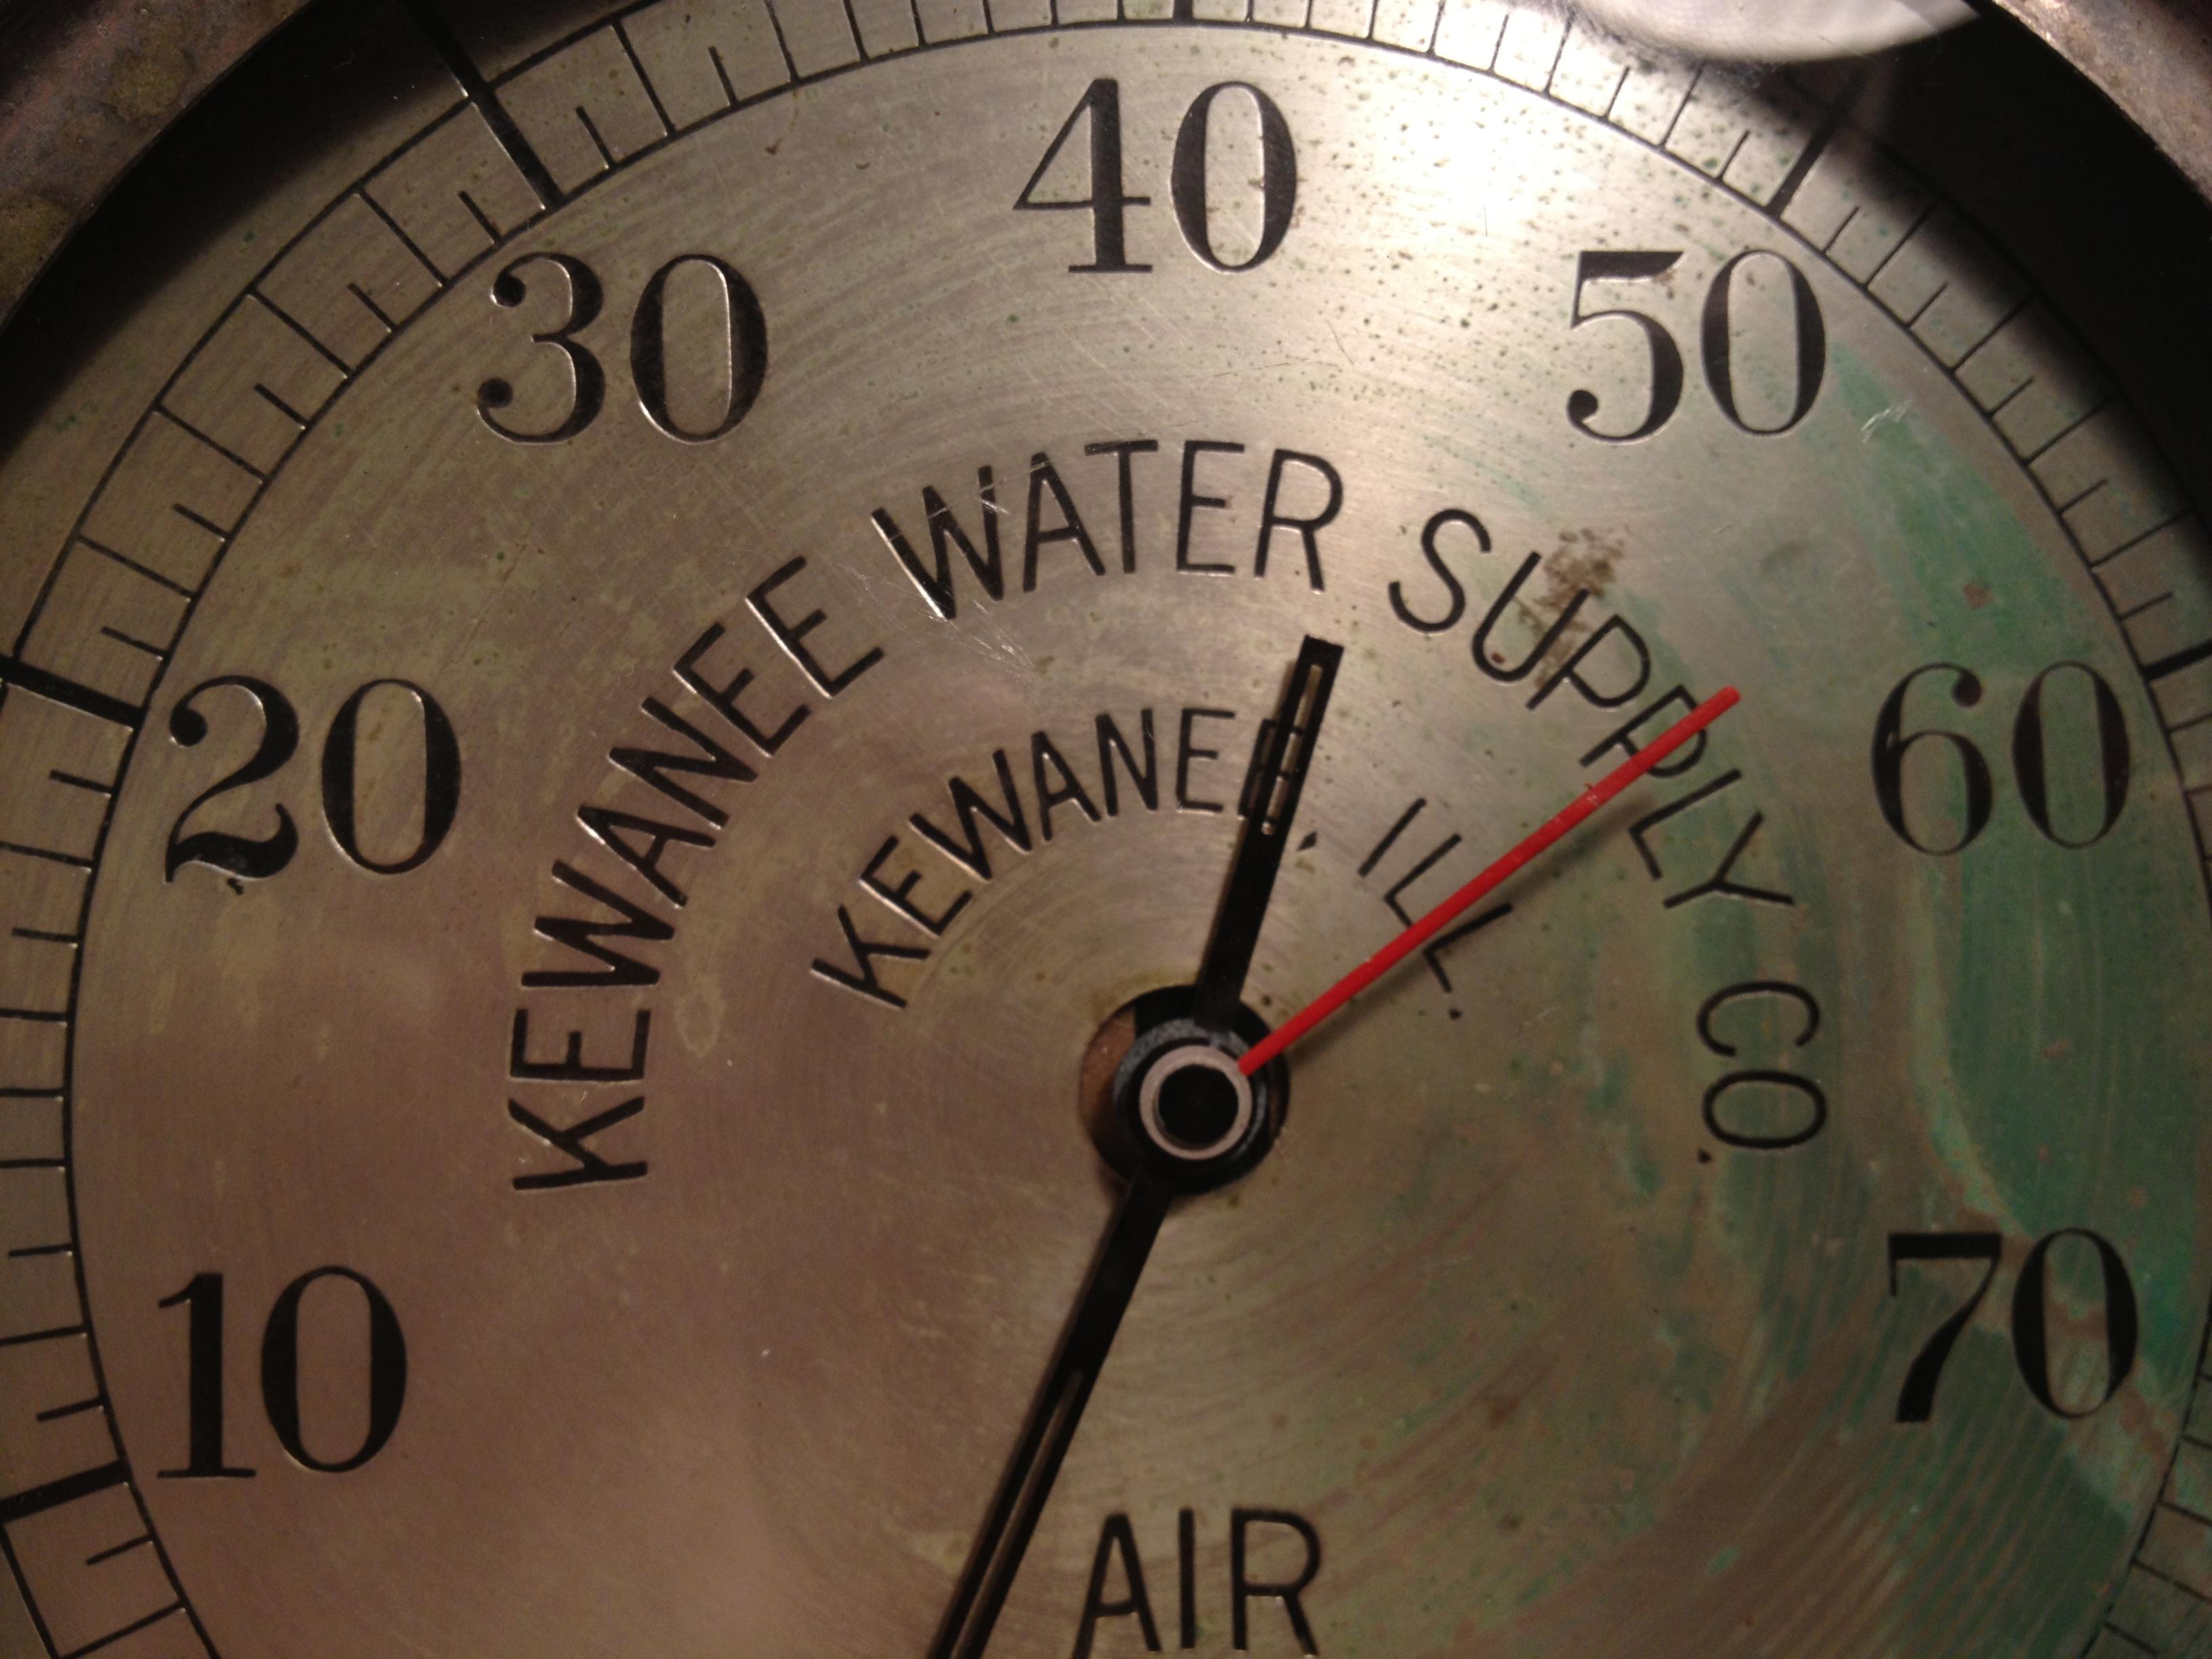 i_gearz_steampunk_hand_made_steam_pressure_gauge_clock_6_battery_op_antique_vintage_clocks_6.JPG